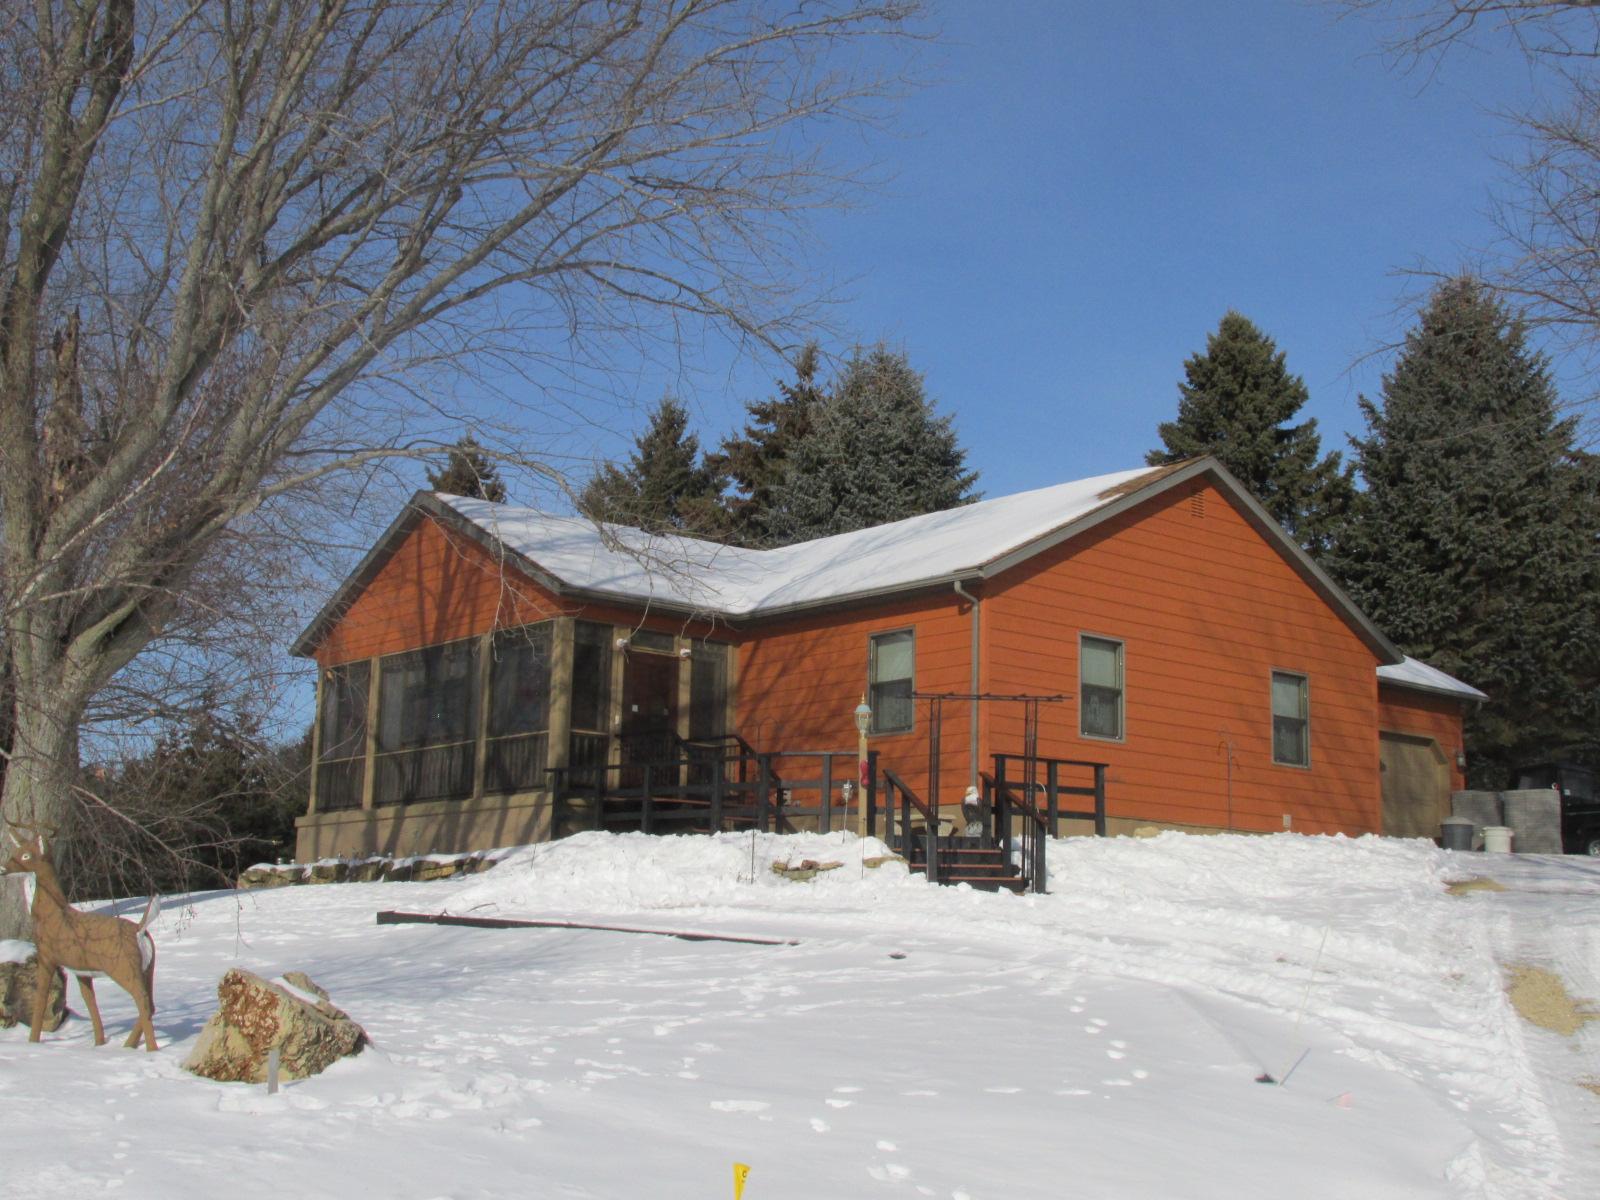 7083 Biglow Hill Rd, Avoca, Wisconsin 53506